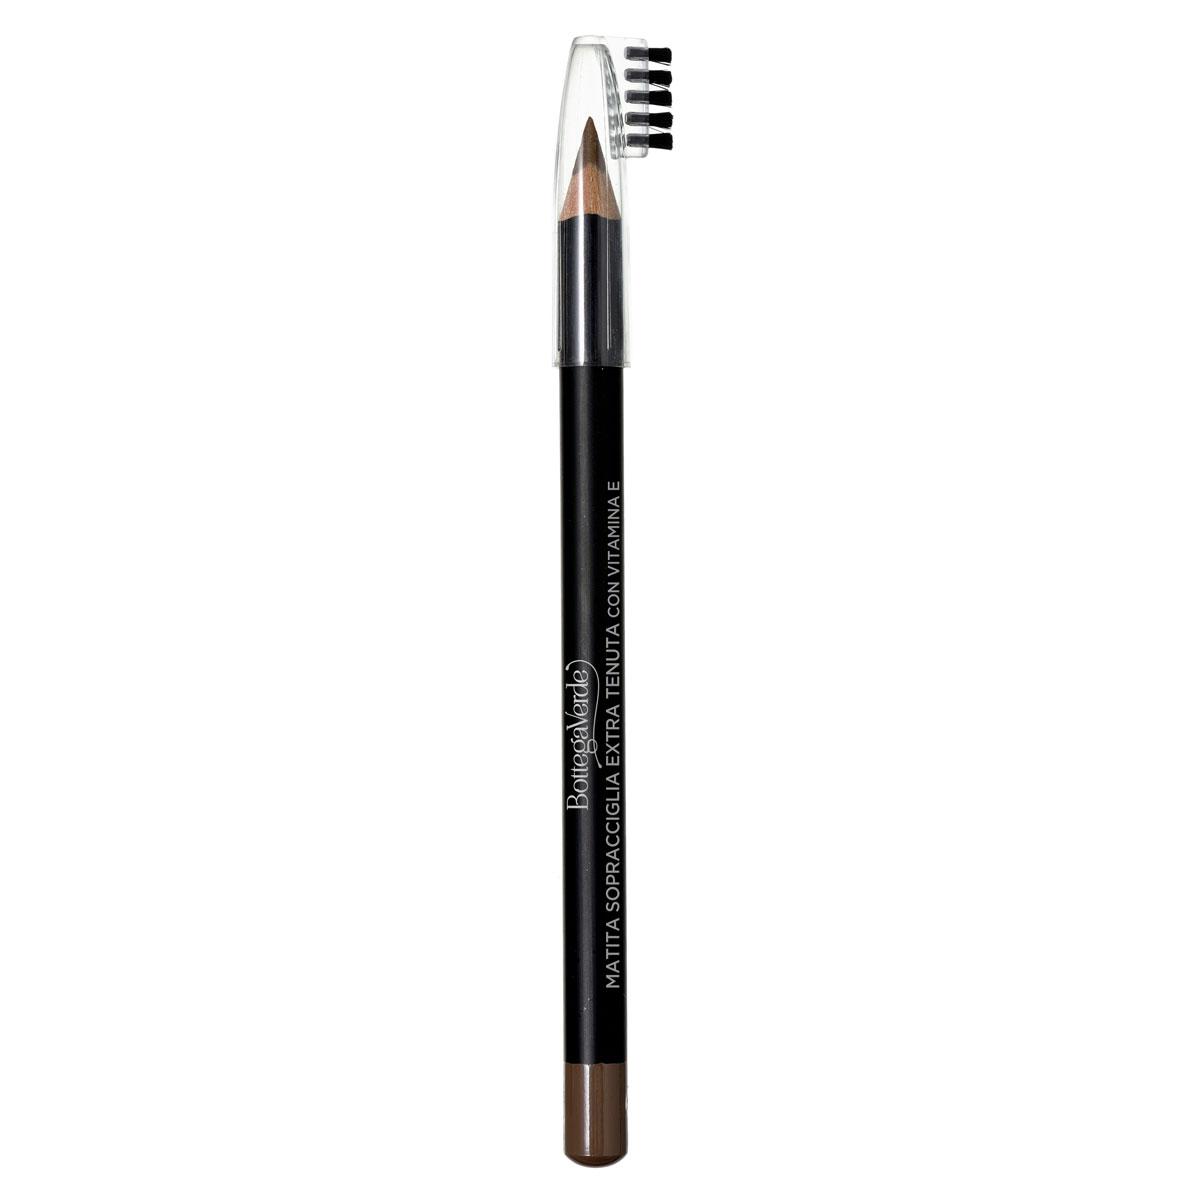 Creion pentru sprancene cu vitamina E imagine